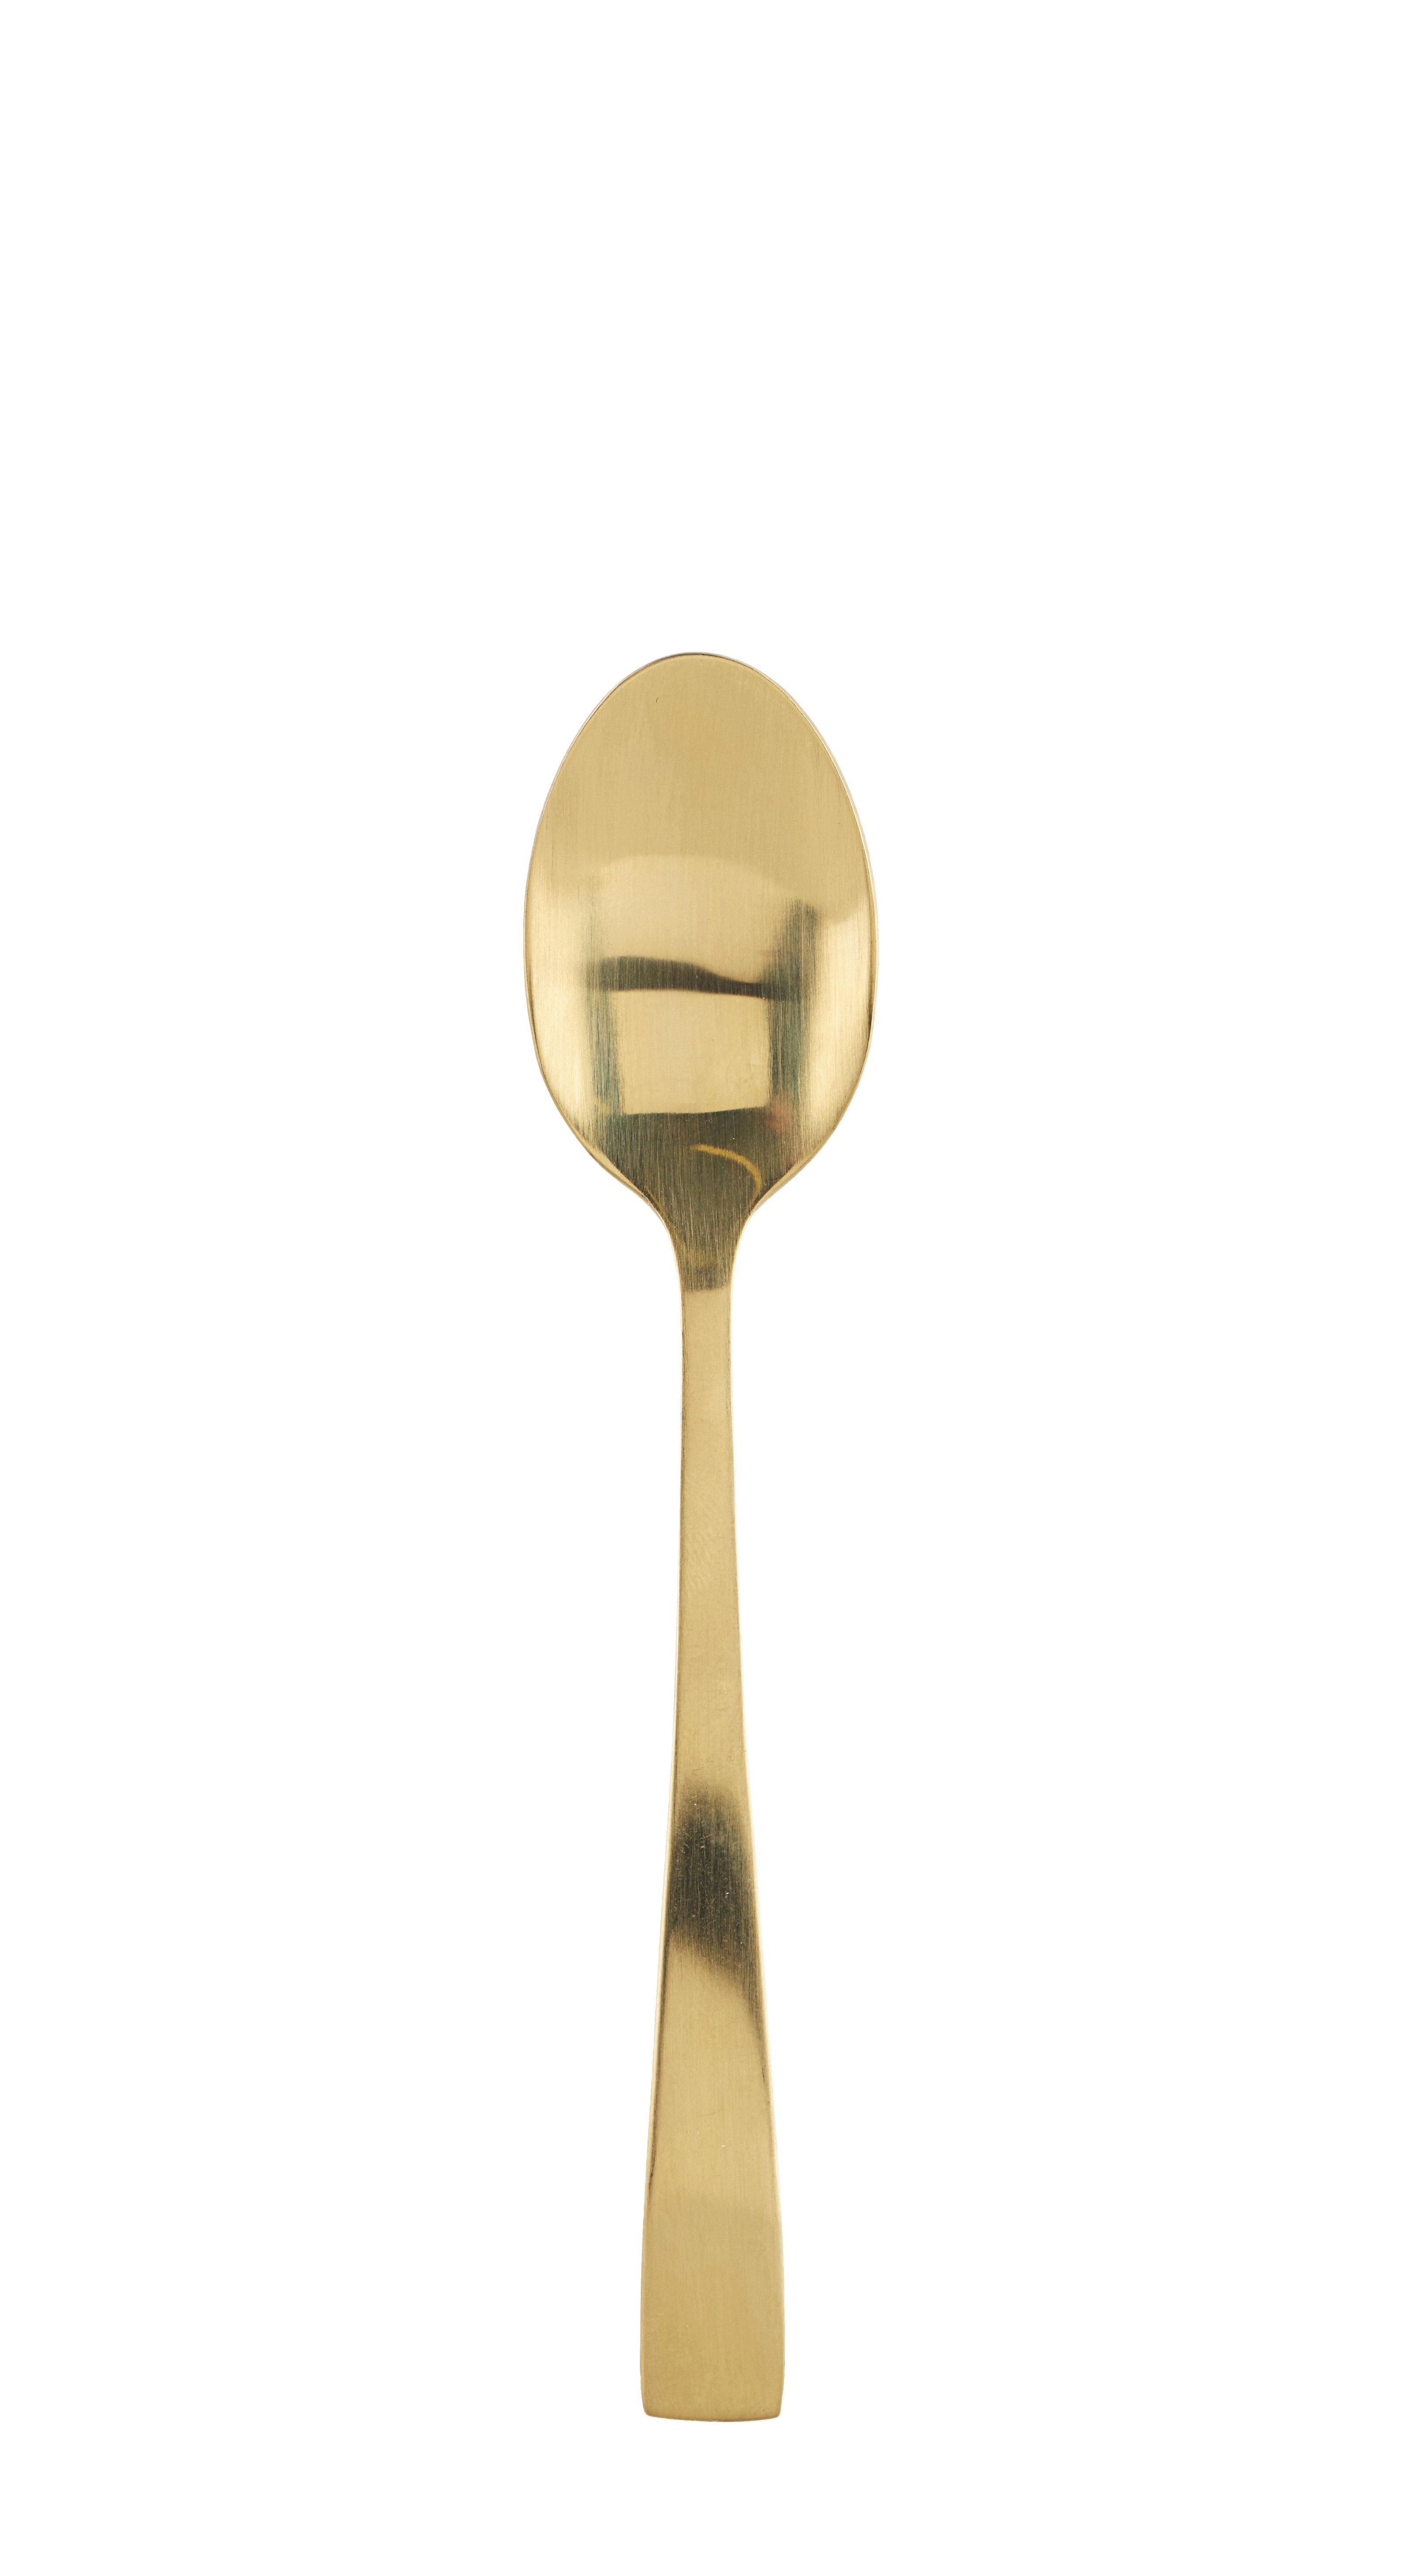 Tableware - Cutlery - Golden Coffee, tea spoon - / L 14.3 cm by House Doctor - Teaspoon / Gold - Stainless steel